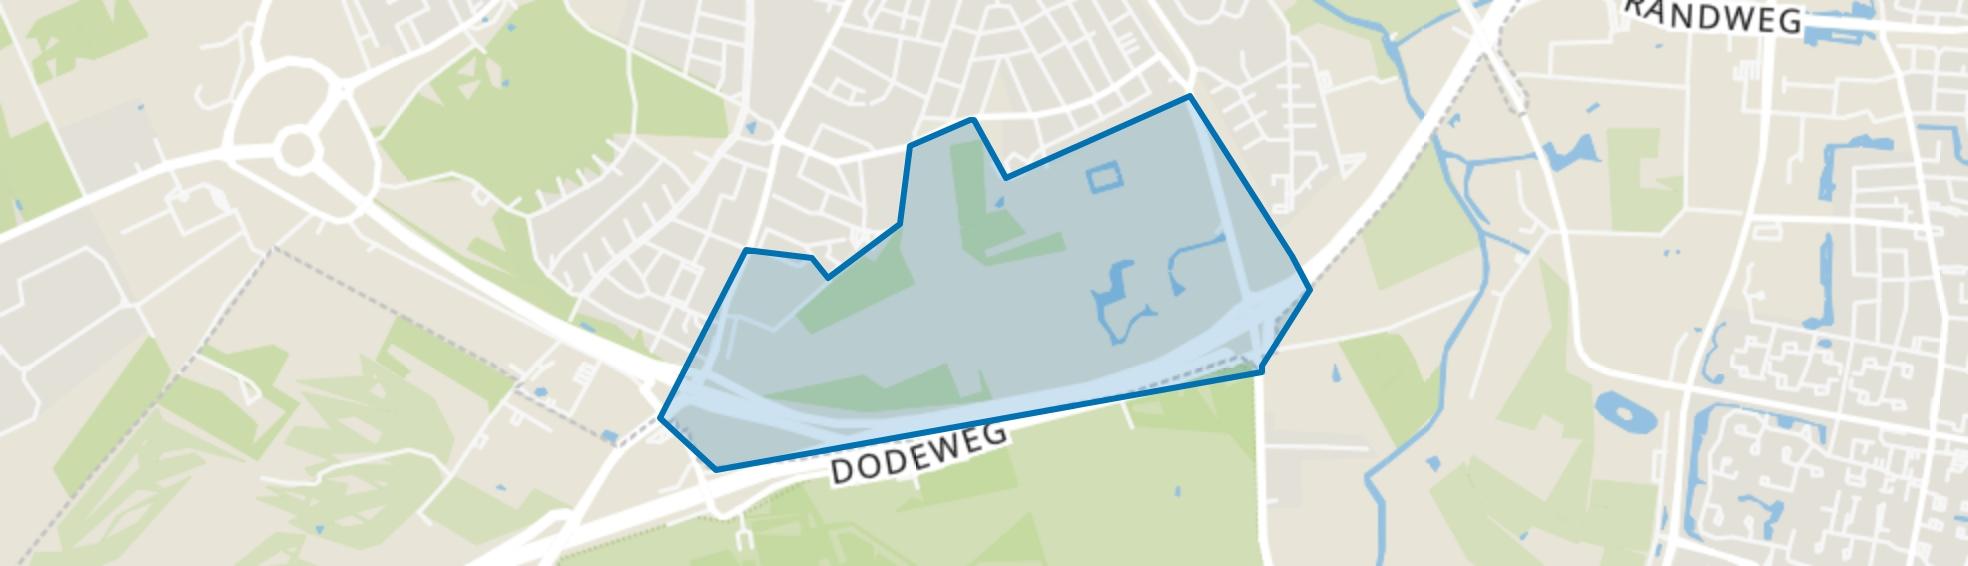 Nimmerdor, Amersfoort map